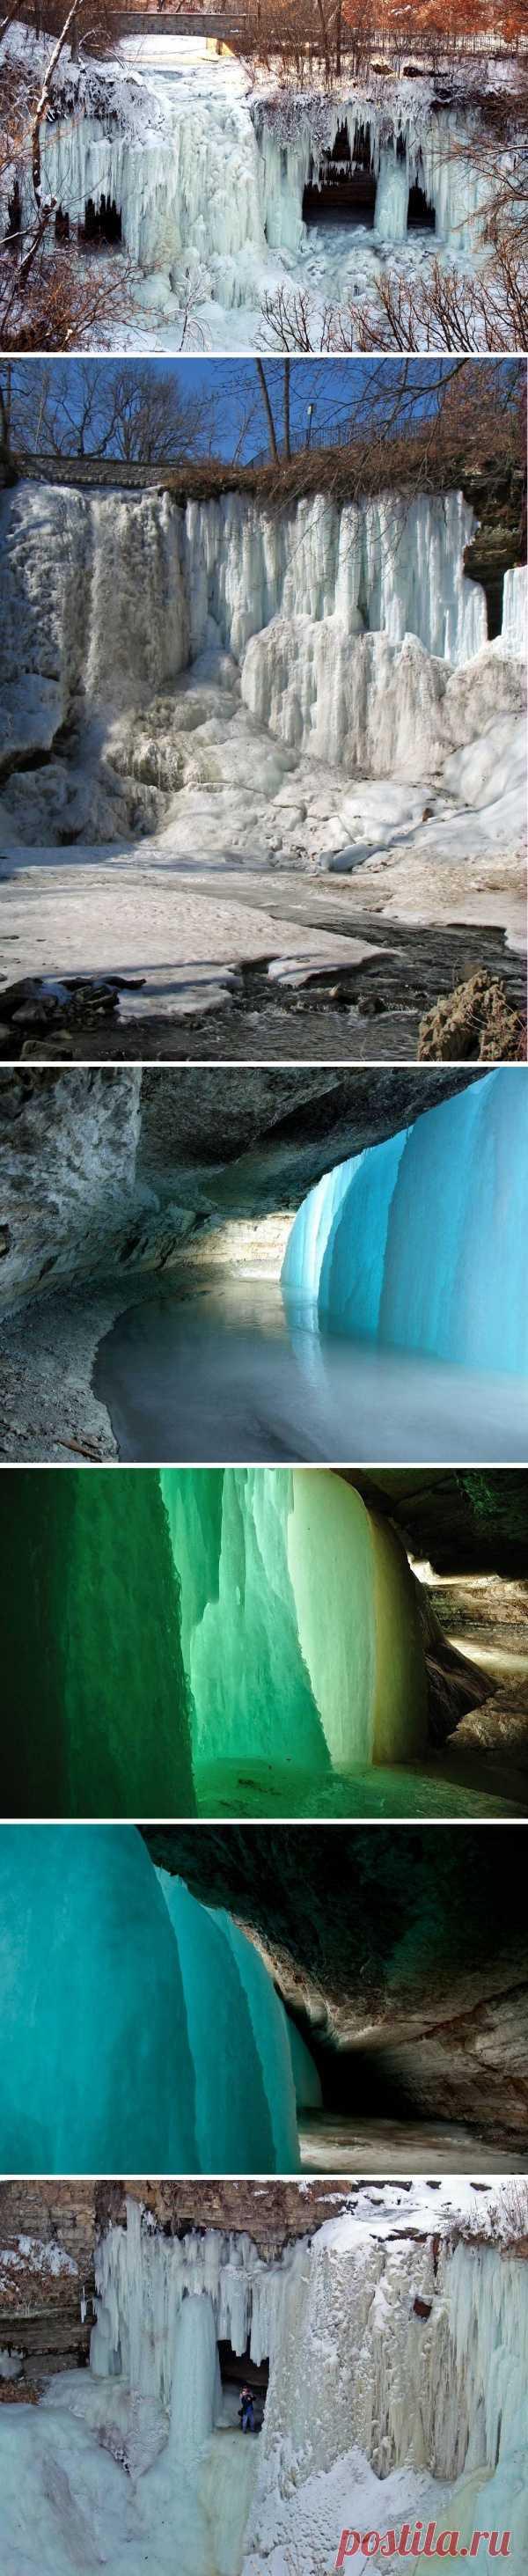 Замерзший водопад Миннехаха. Минесота, США